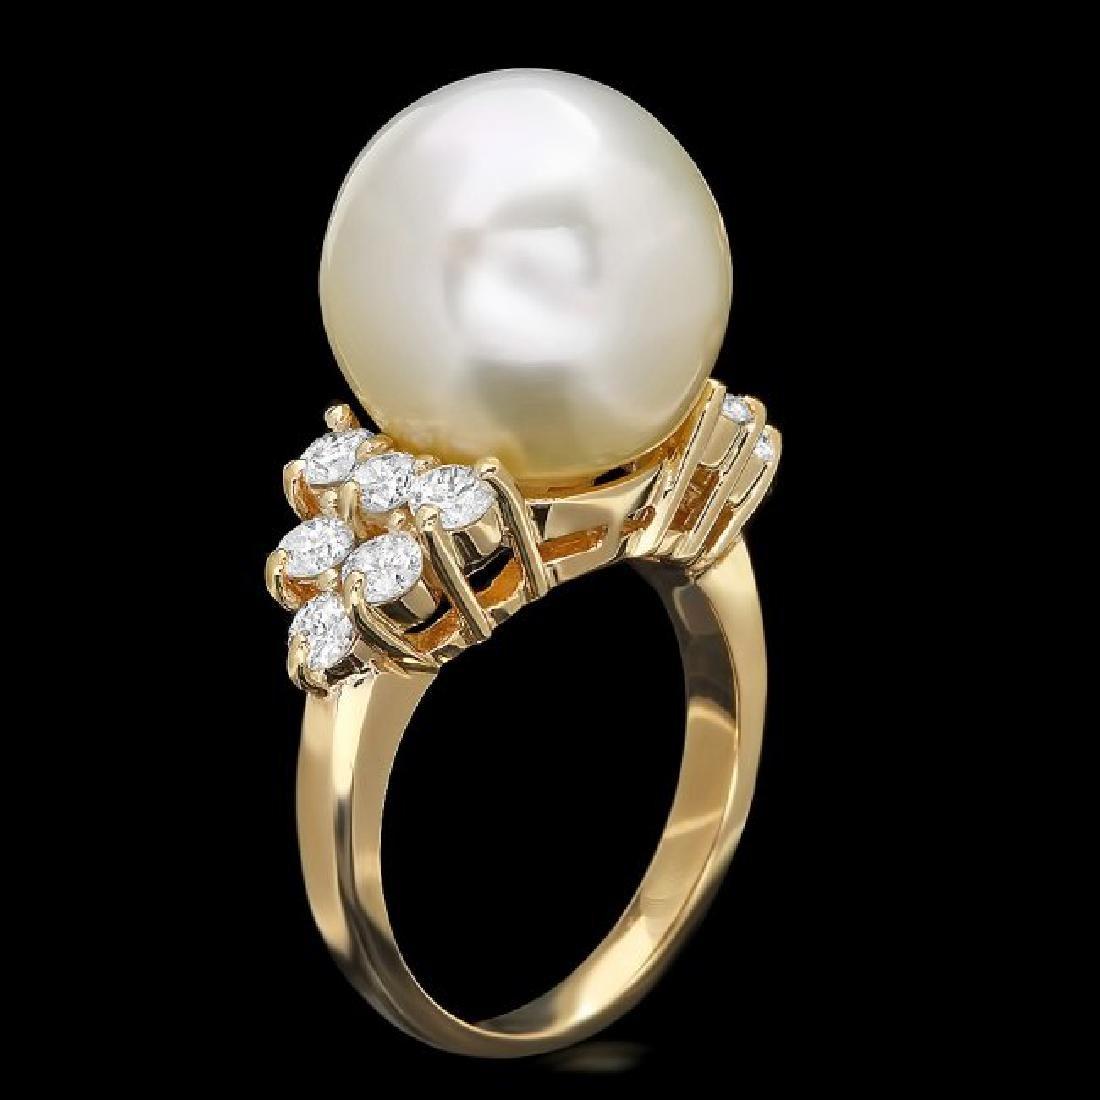 14k Gold 14 X 14mm Pearl 1.15ct Diamond Ring - 2